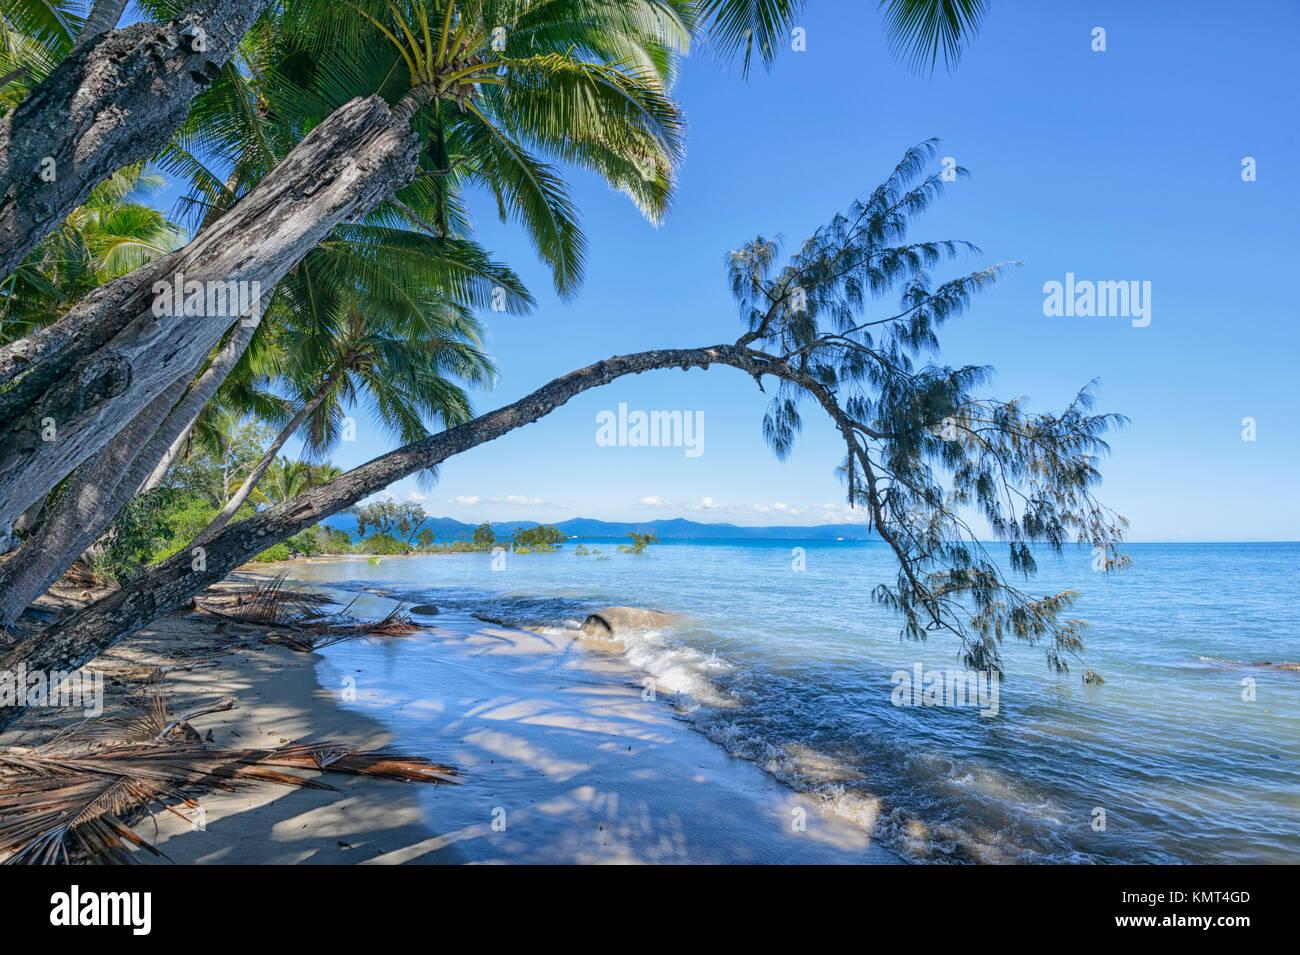 Scenic coastline at Yarrabah, Aborignal Shire, near Cairns, Far North Queensland, FNQ, QLD, Australia - Stock Image